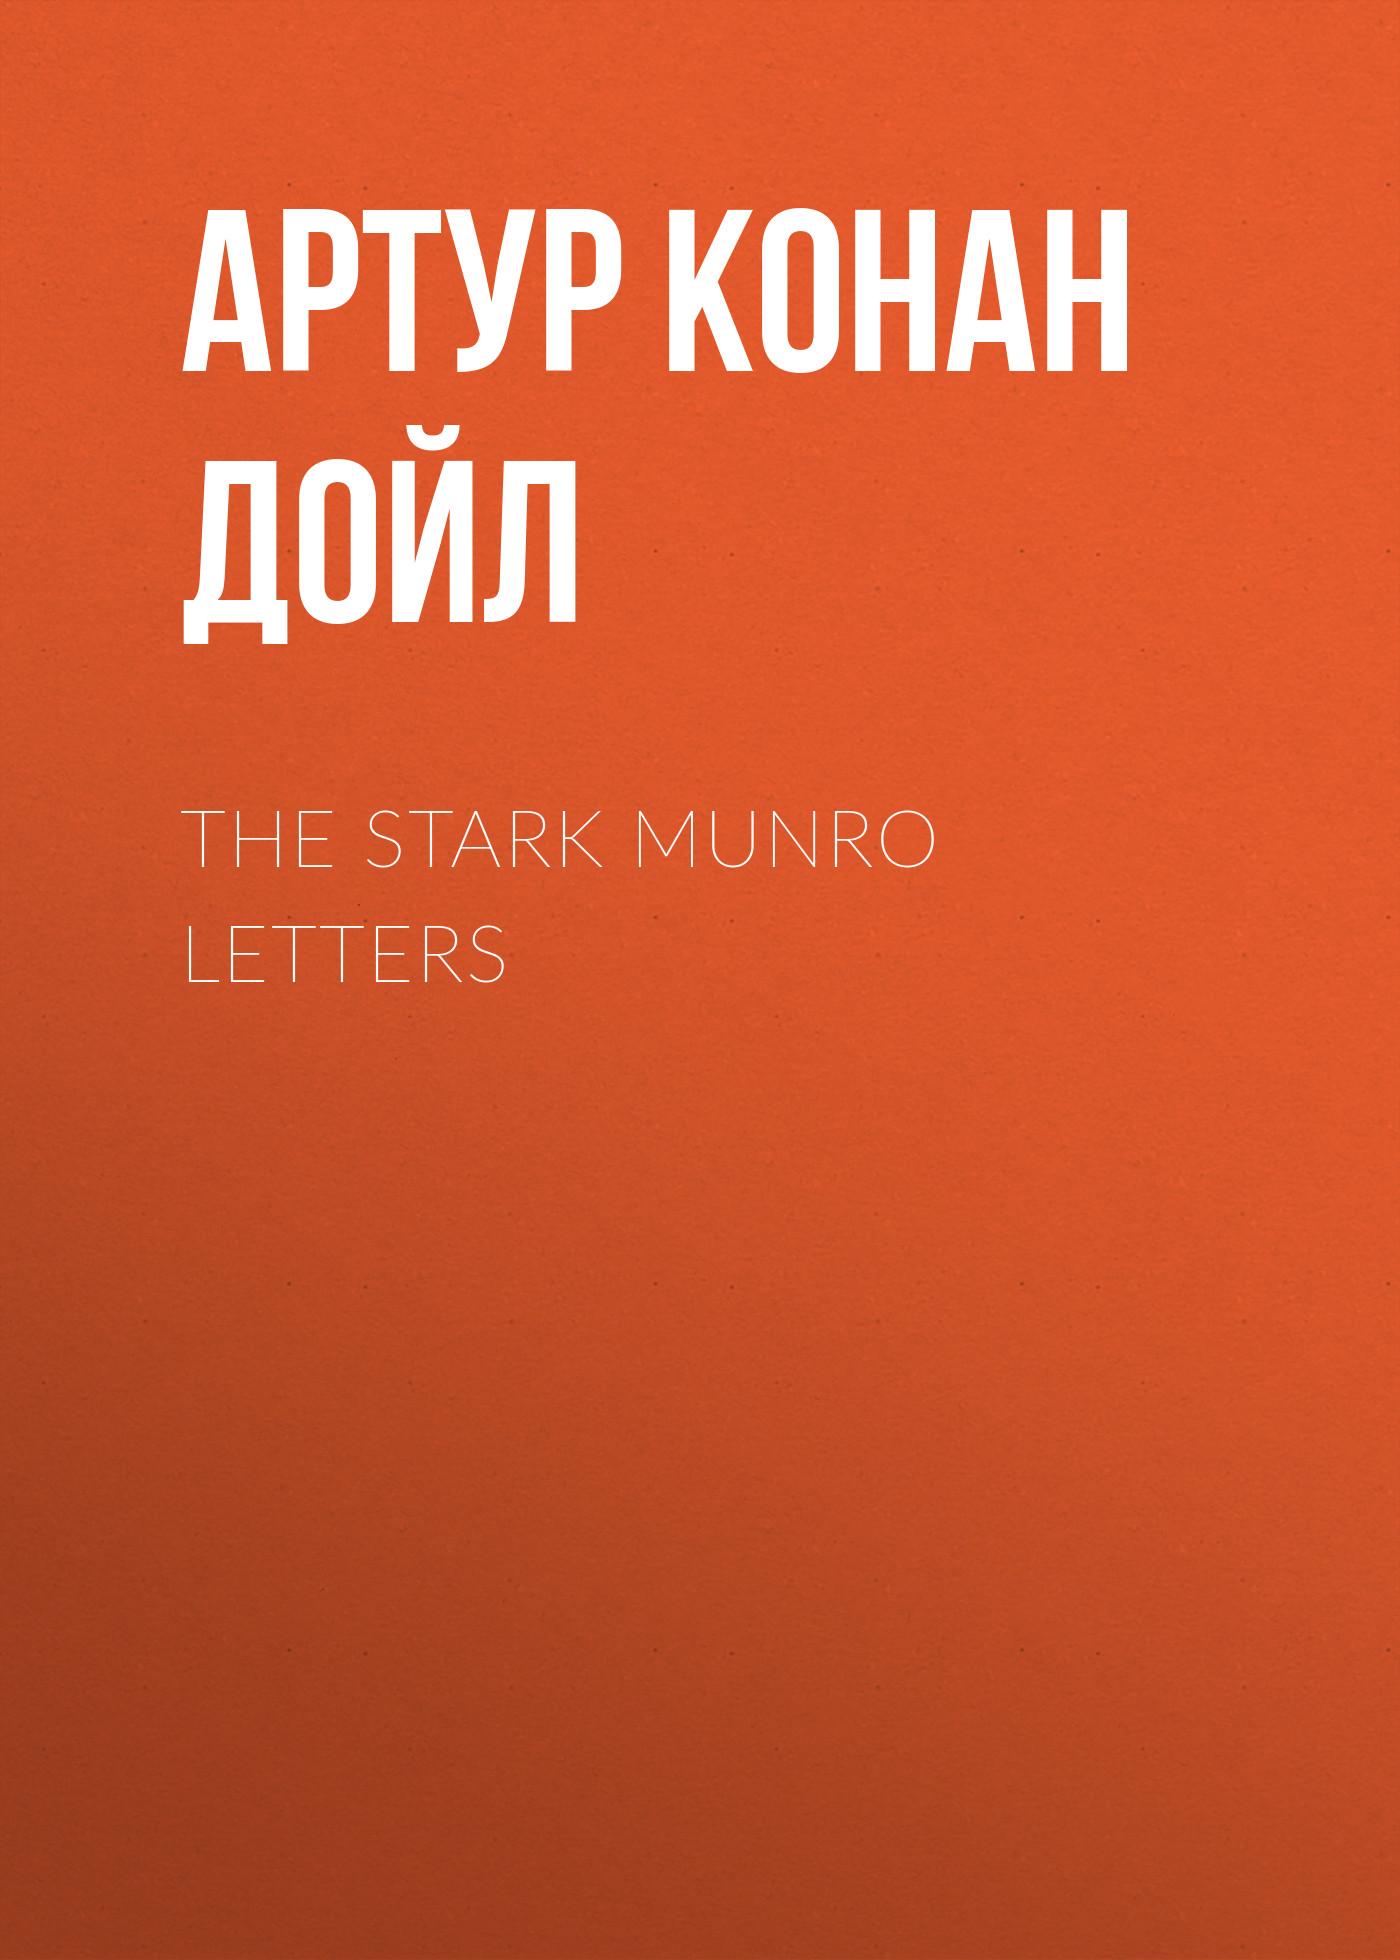 Артур Конан Дойл The Stark Munro Letters артур конан дойл through the magic door